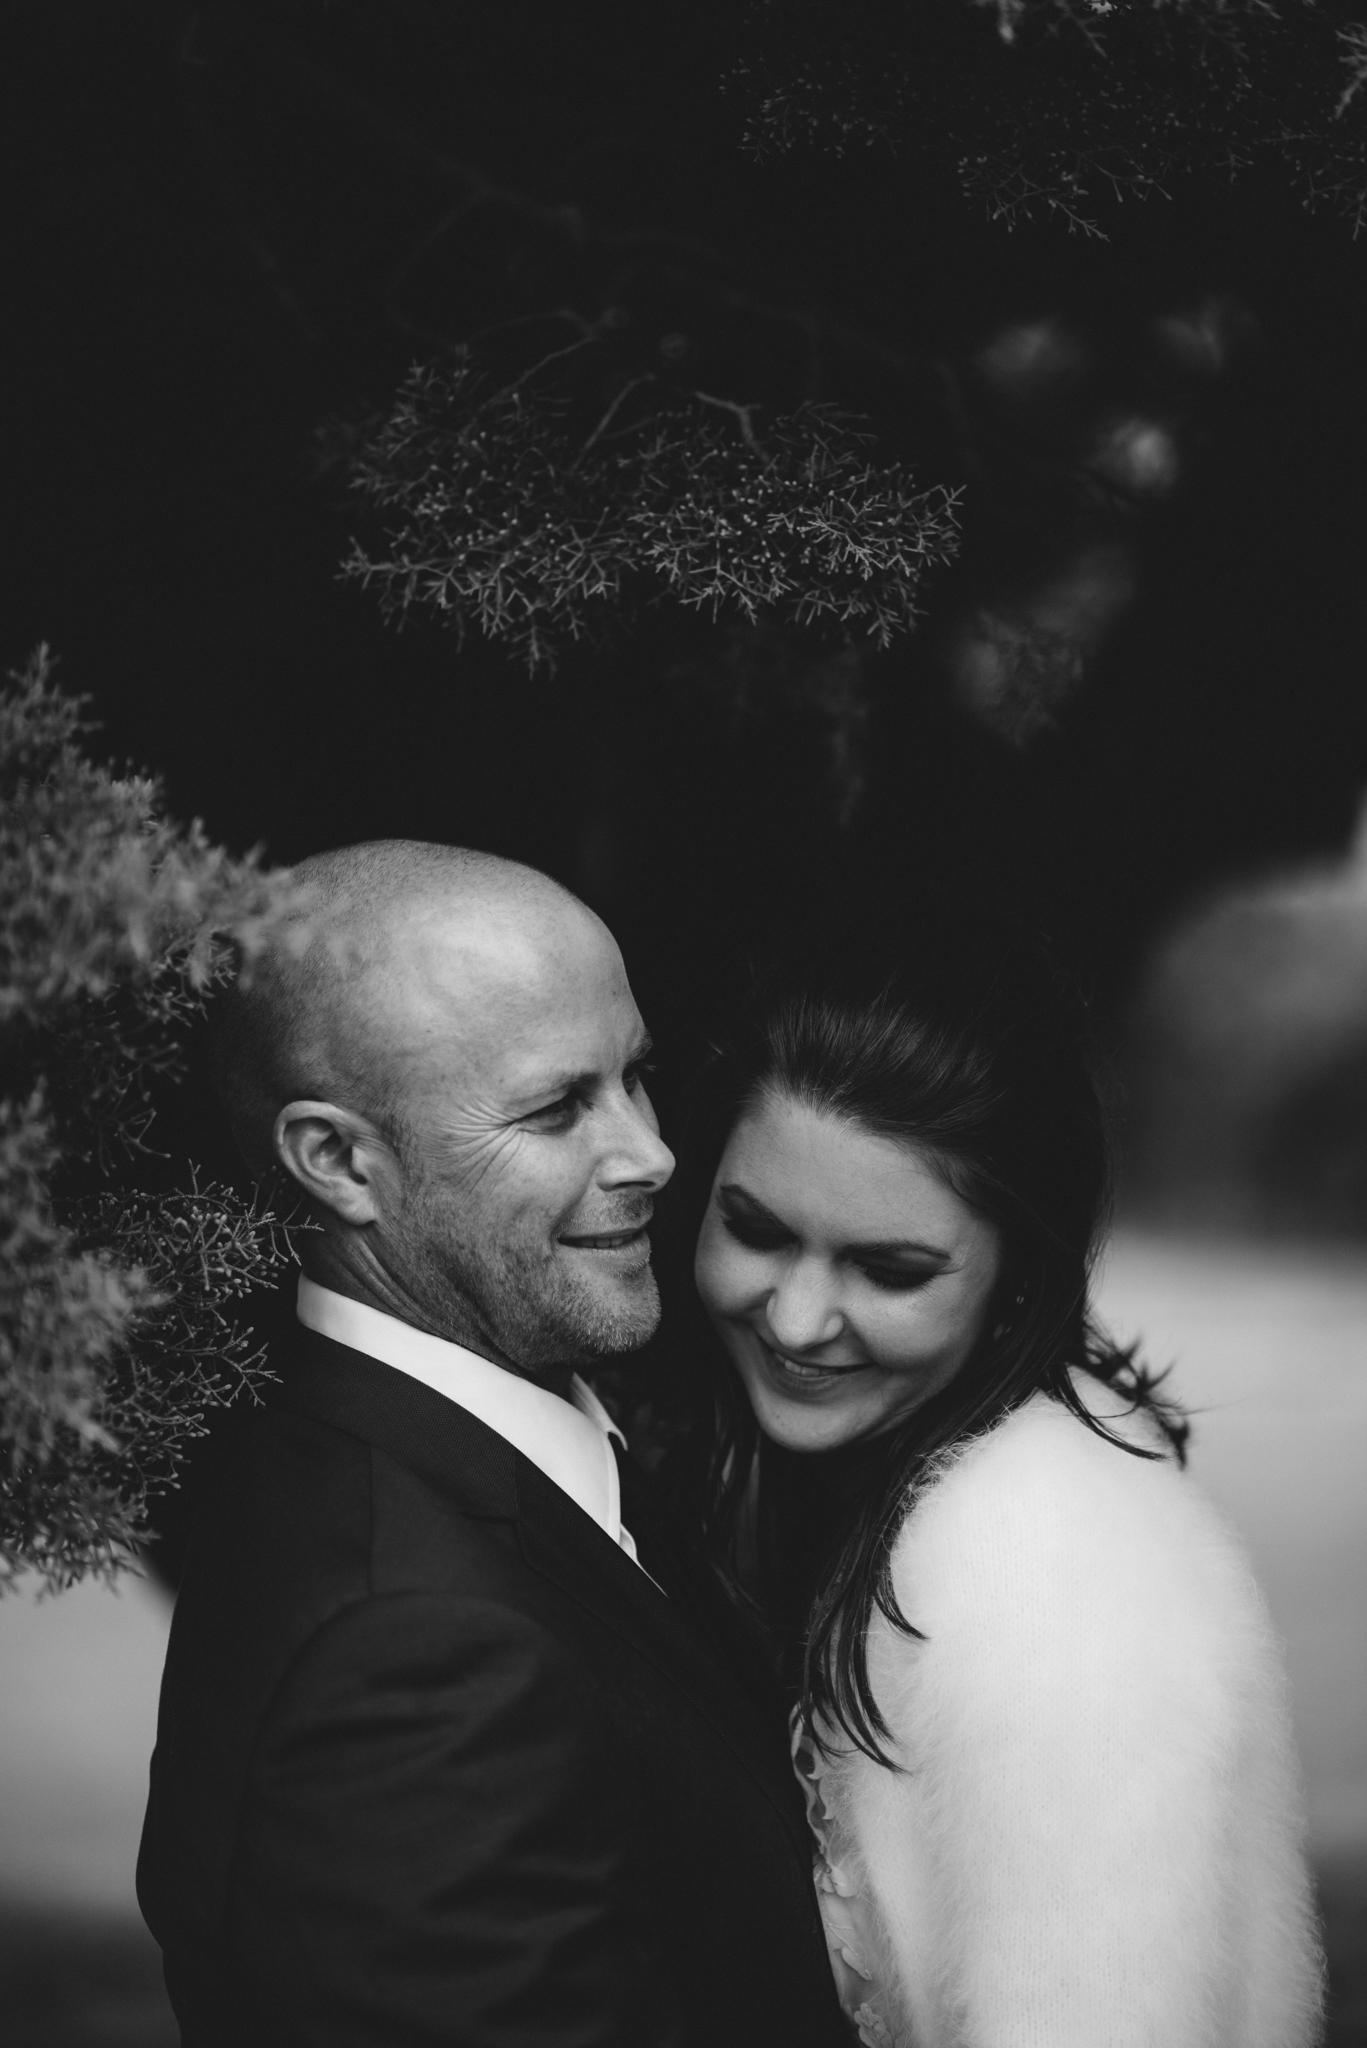 LOVELENSCAPES PHOTOGRAPHY • VISUAL POETRY • NEW ZEALAND WEDDING PHOTOGRAPHER • AUSTRALIAN WEDDING PHOTOGRAPHER • BRISBANE • MELBOURNE • SYDNEY • HOBART • TARUREKA ESTATE • ANNA CAMPBELL • 149.jpg